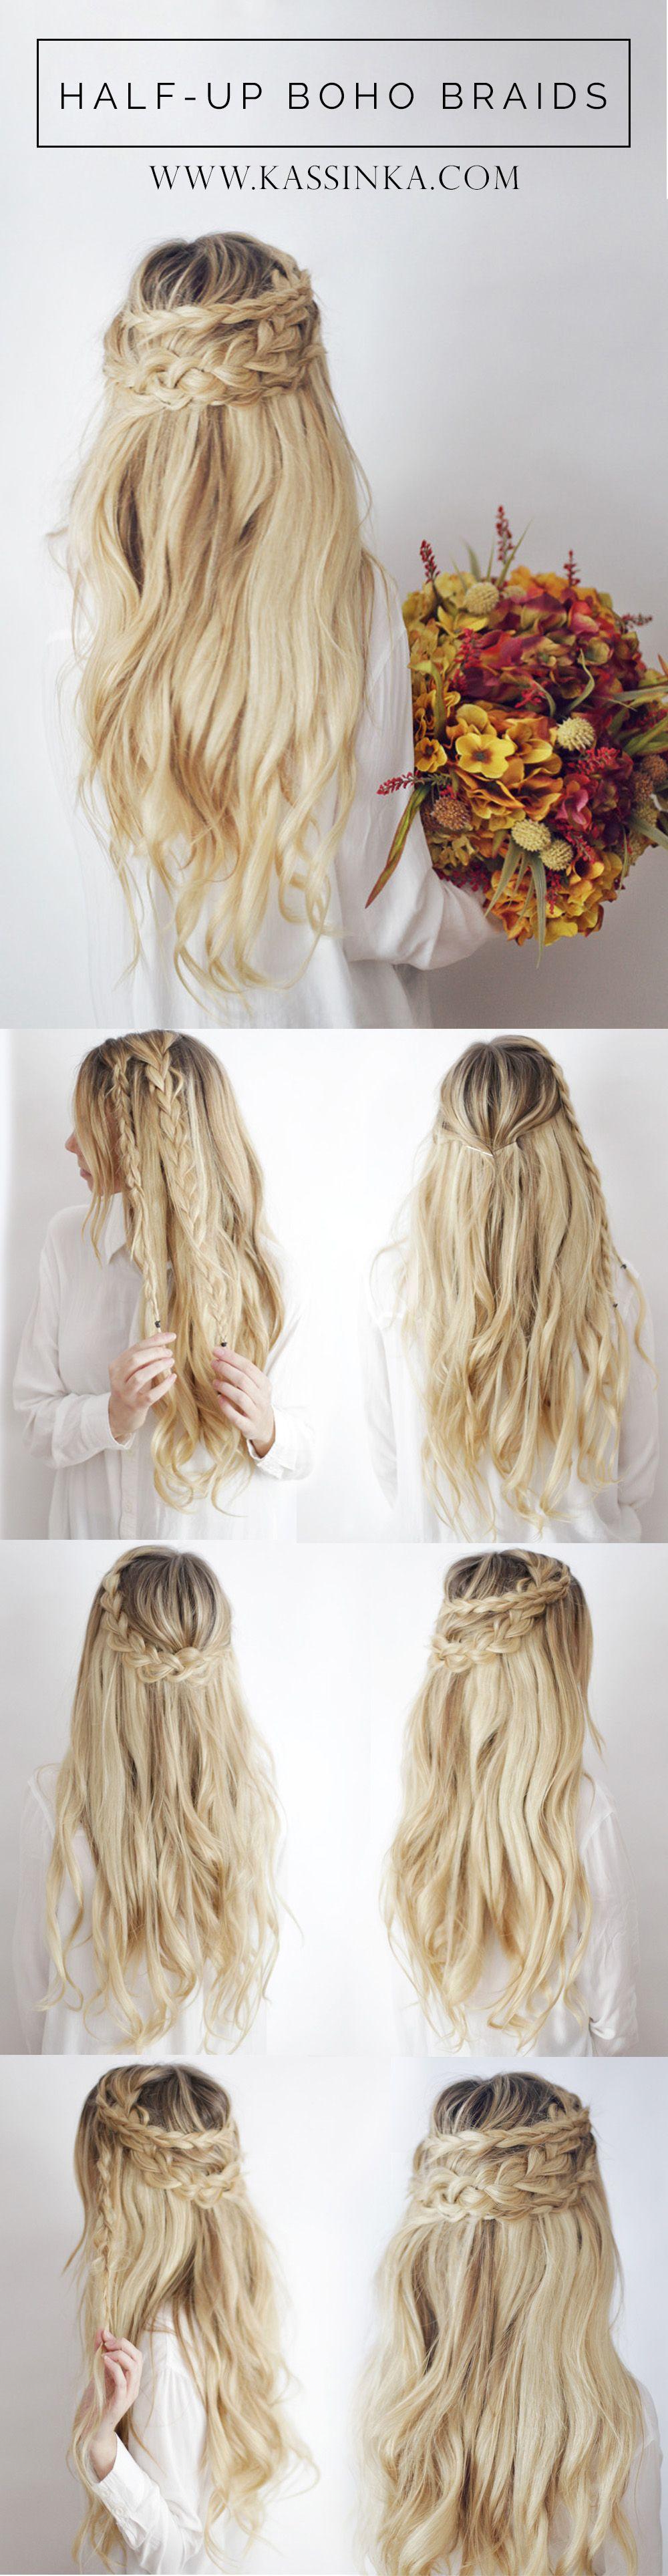 Hair tutorial for halfup boho braids hairstyles pinterest